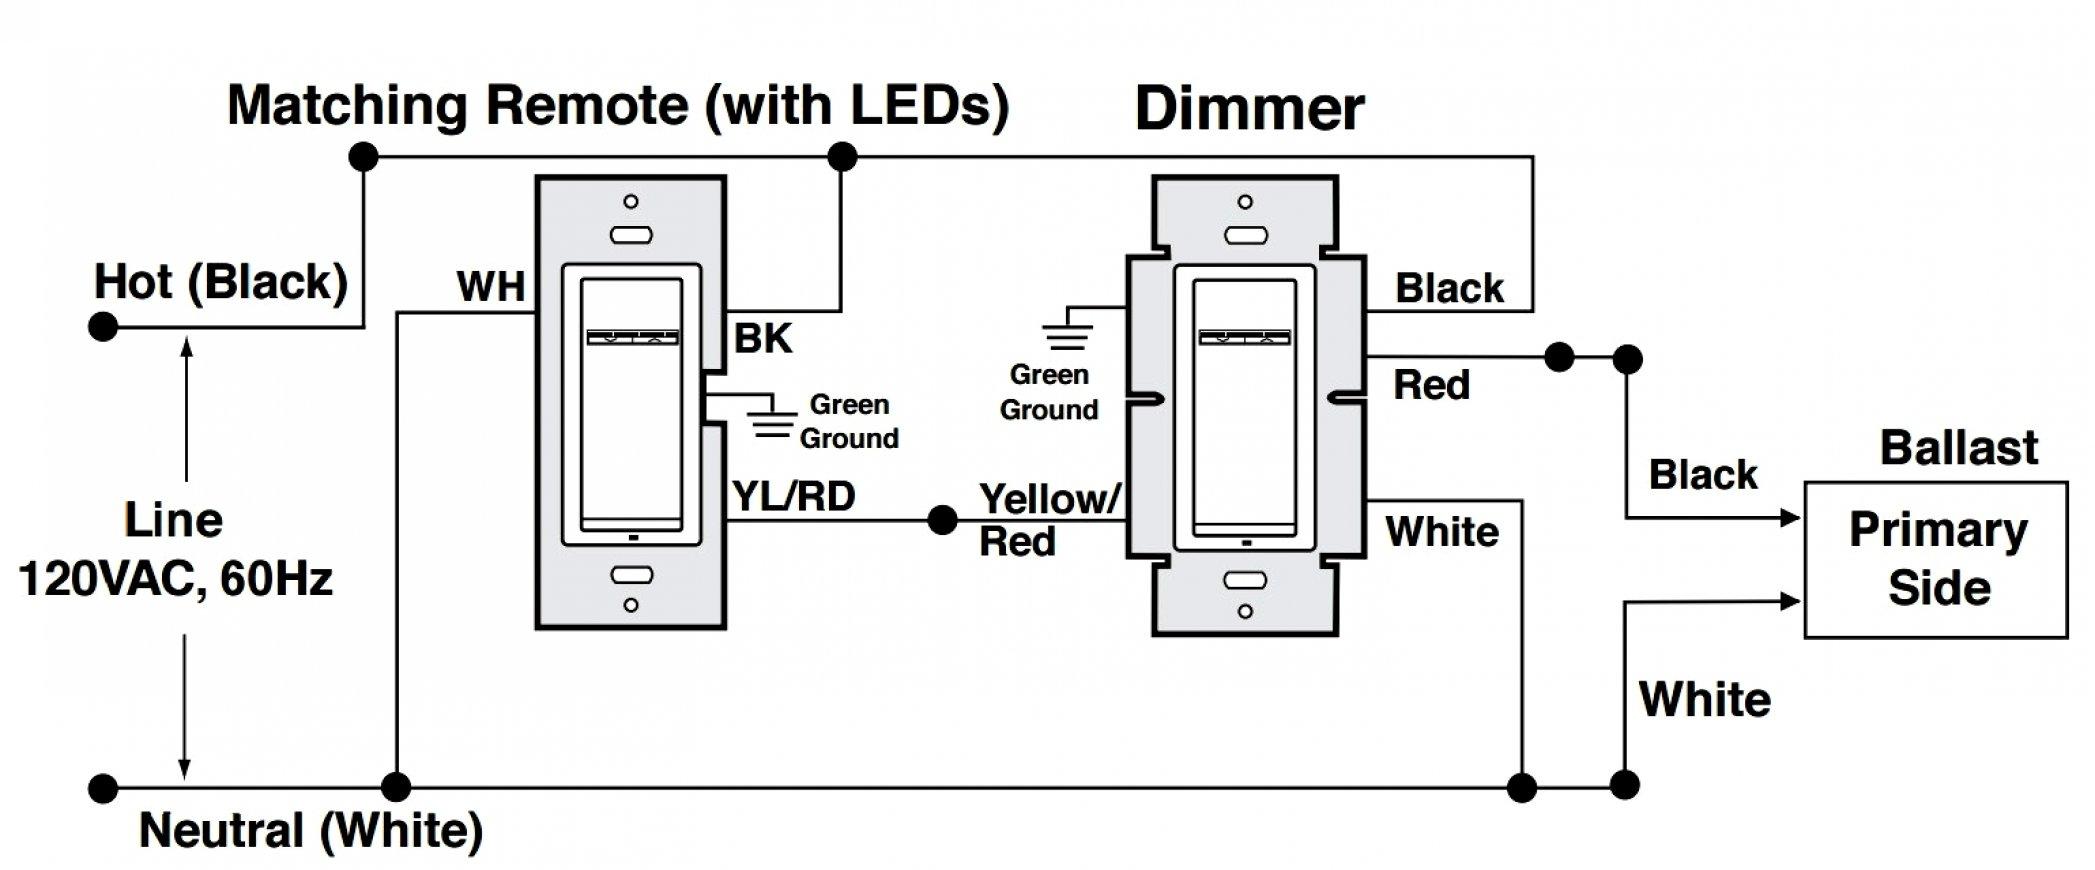 Leviton 4 Way Switch Diagram | Wiring Diagram - Leviton 4 Way Switch Wiring Diagram